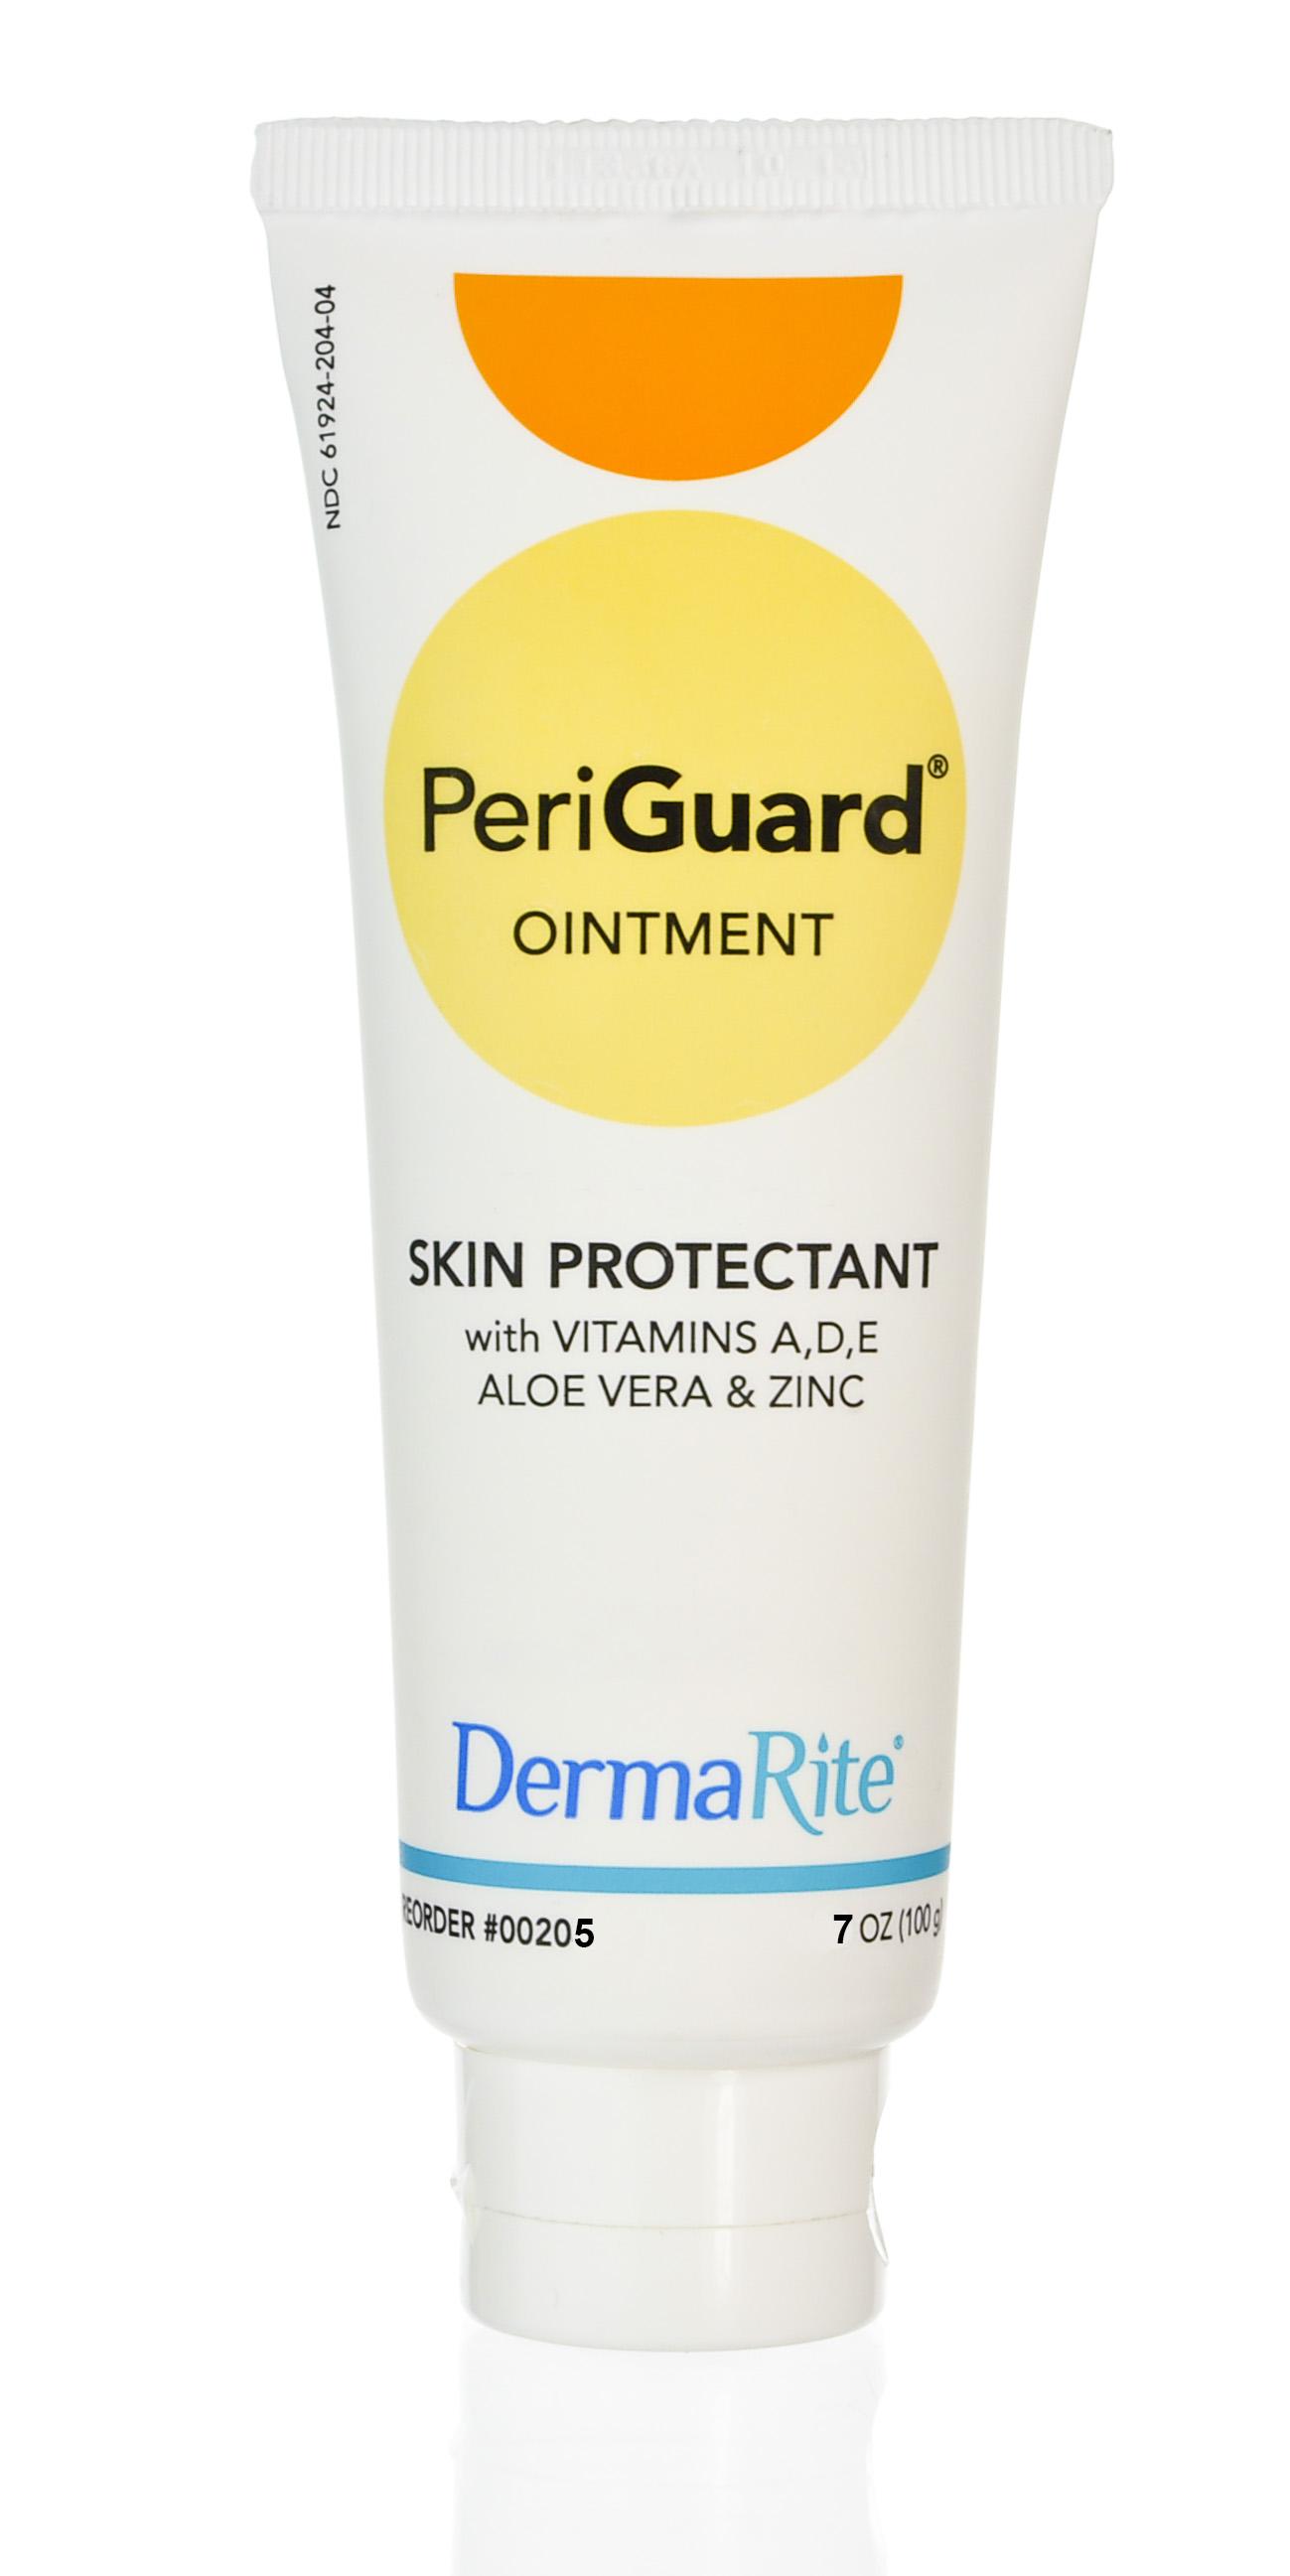 Dermarite 00205 PeriGuard Skin Protectant Ointment 7 oz tube at  IndeMedical com